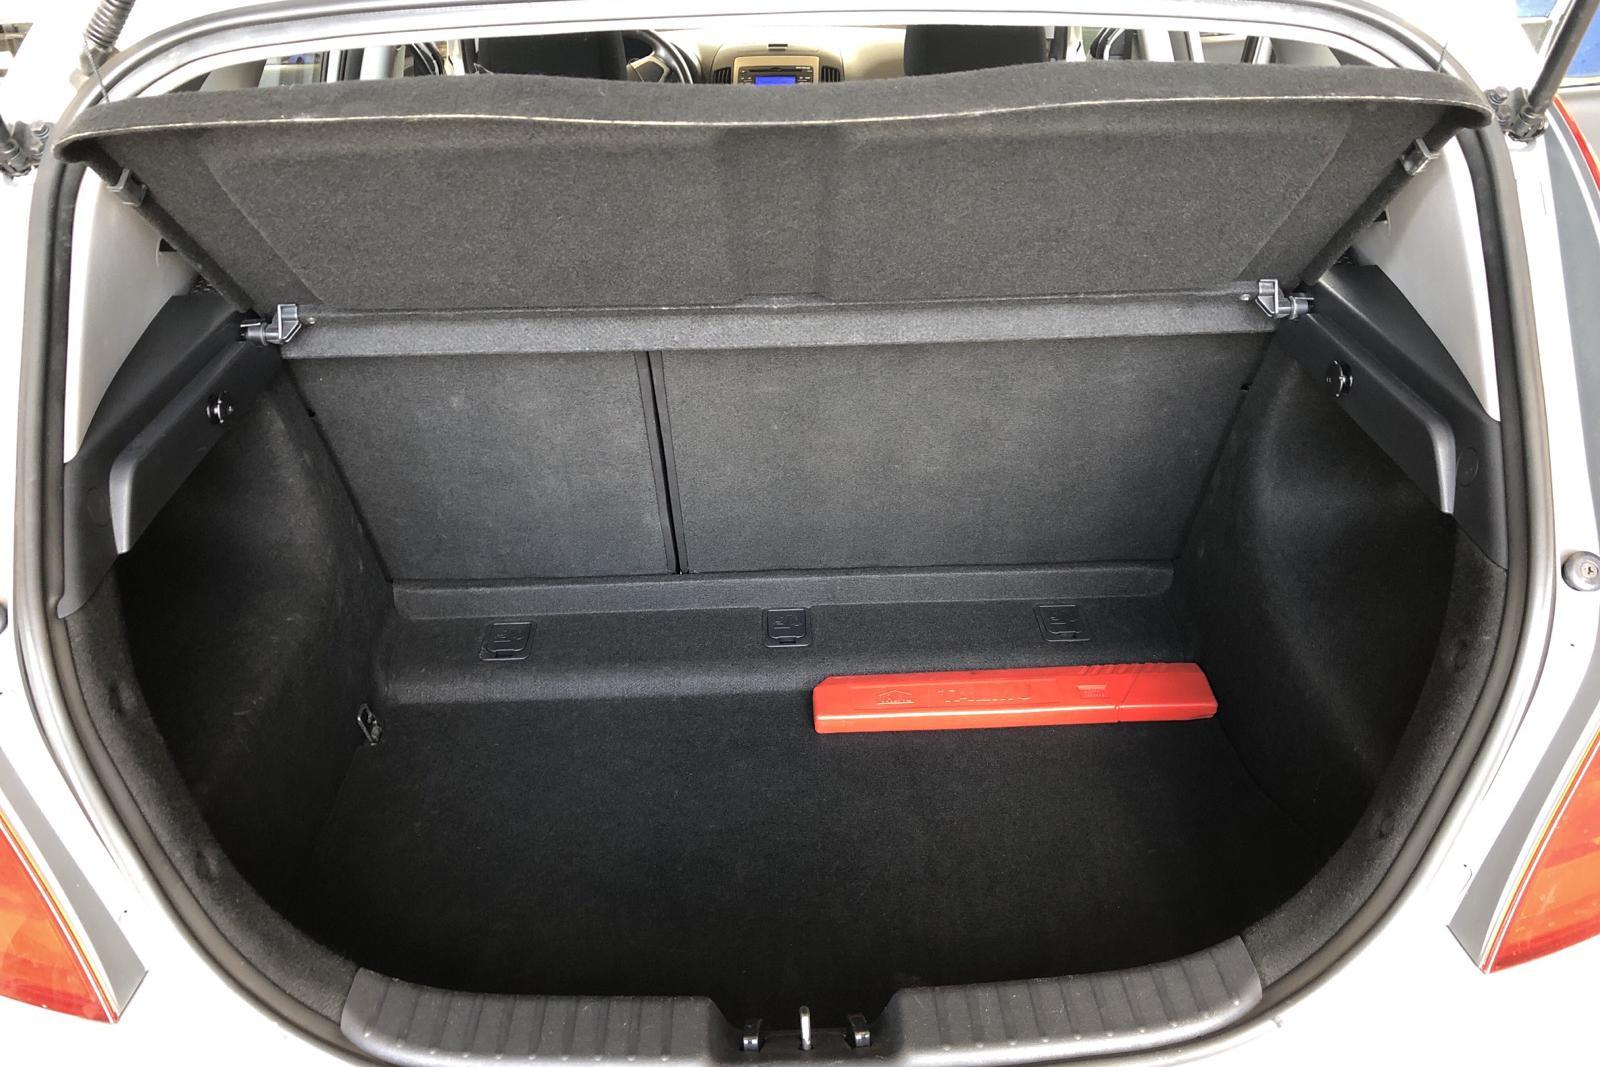 Hyundai i30 1.6 5dr (122hk) - 66 510 km - Manual - silver - 2008